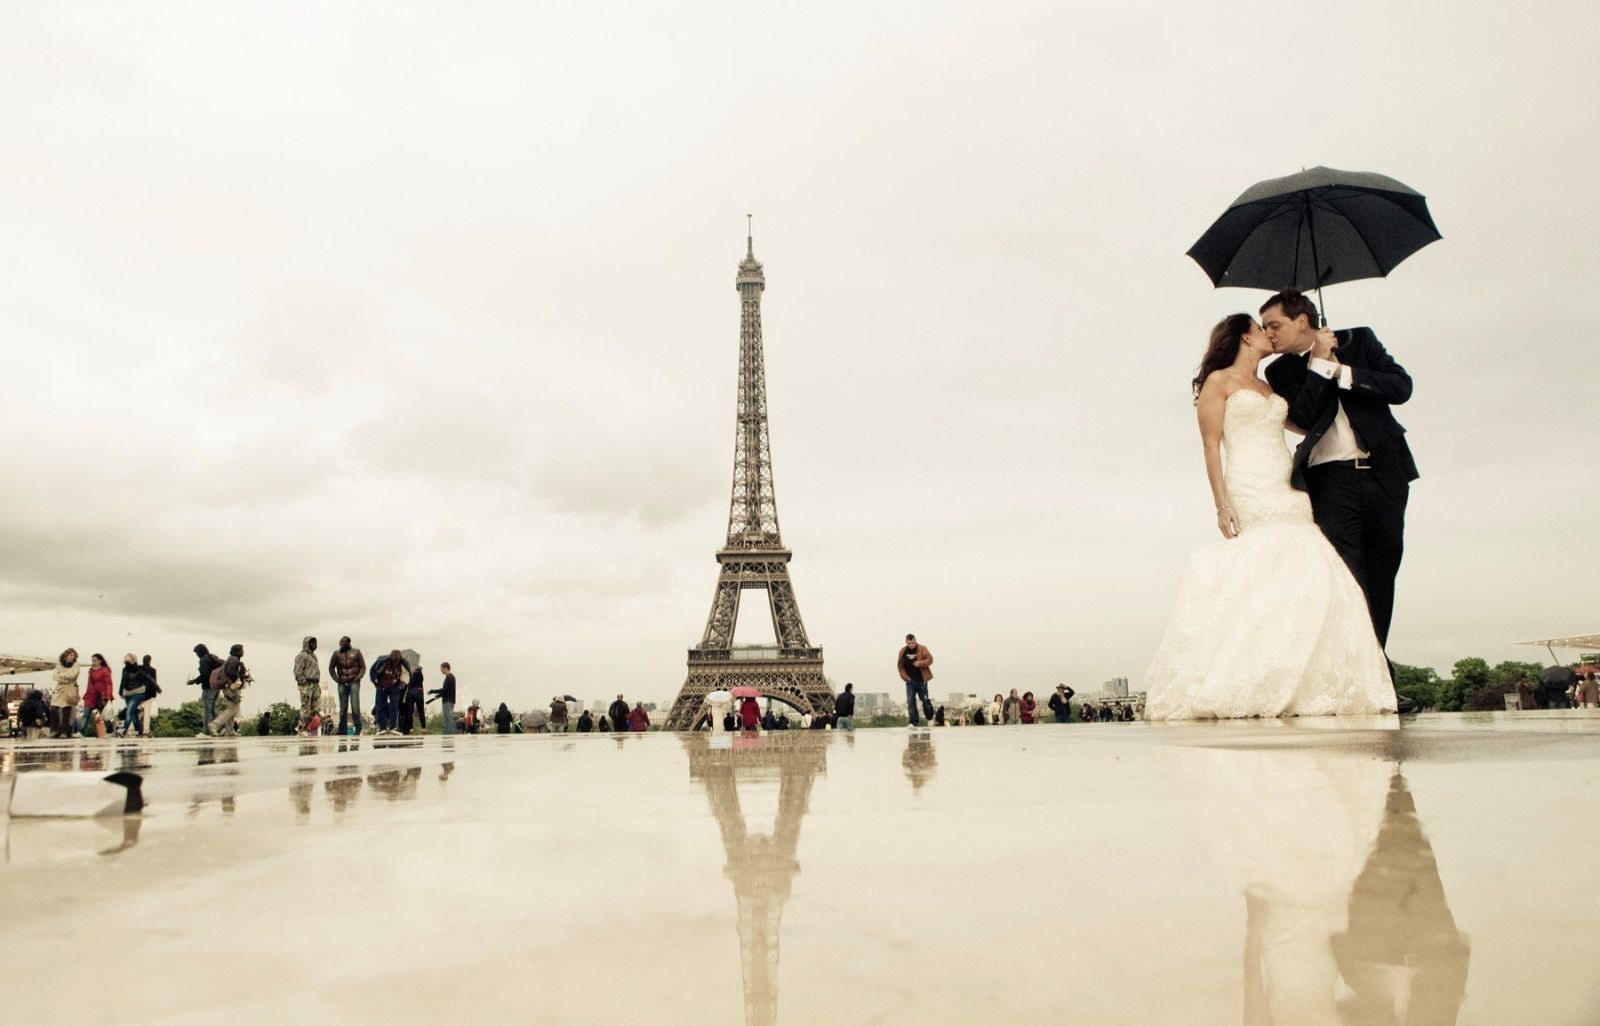 120162 Pretty Paris Romantic with Decor WALL PRINT POSTER AU